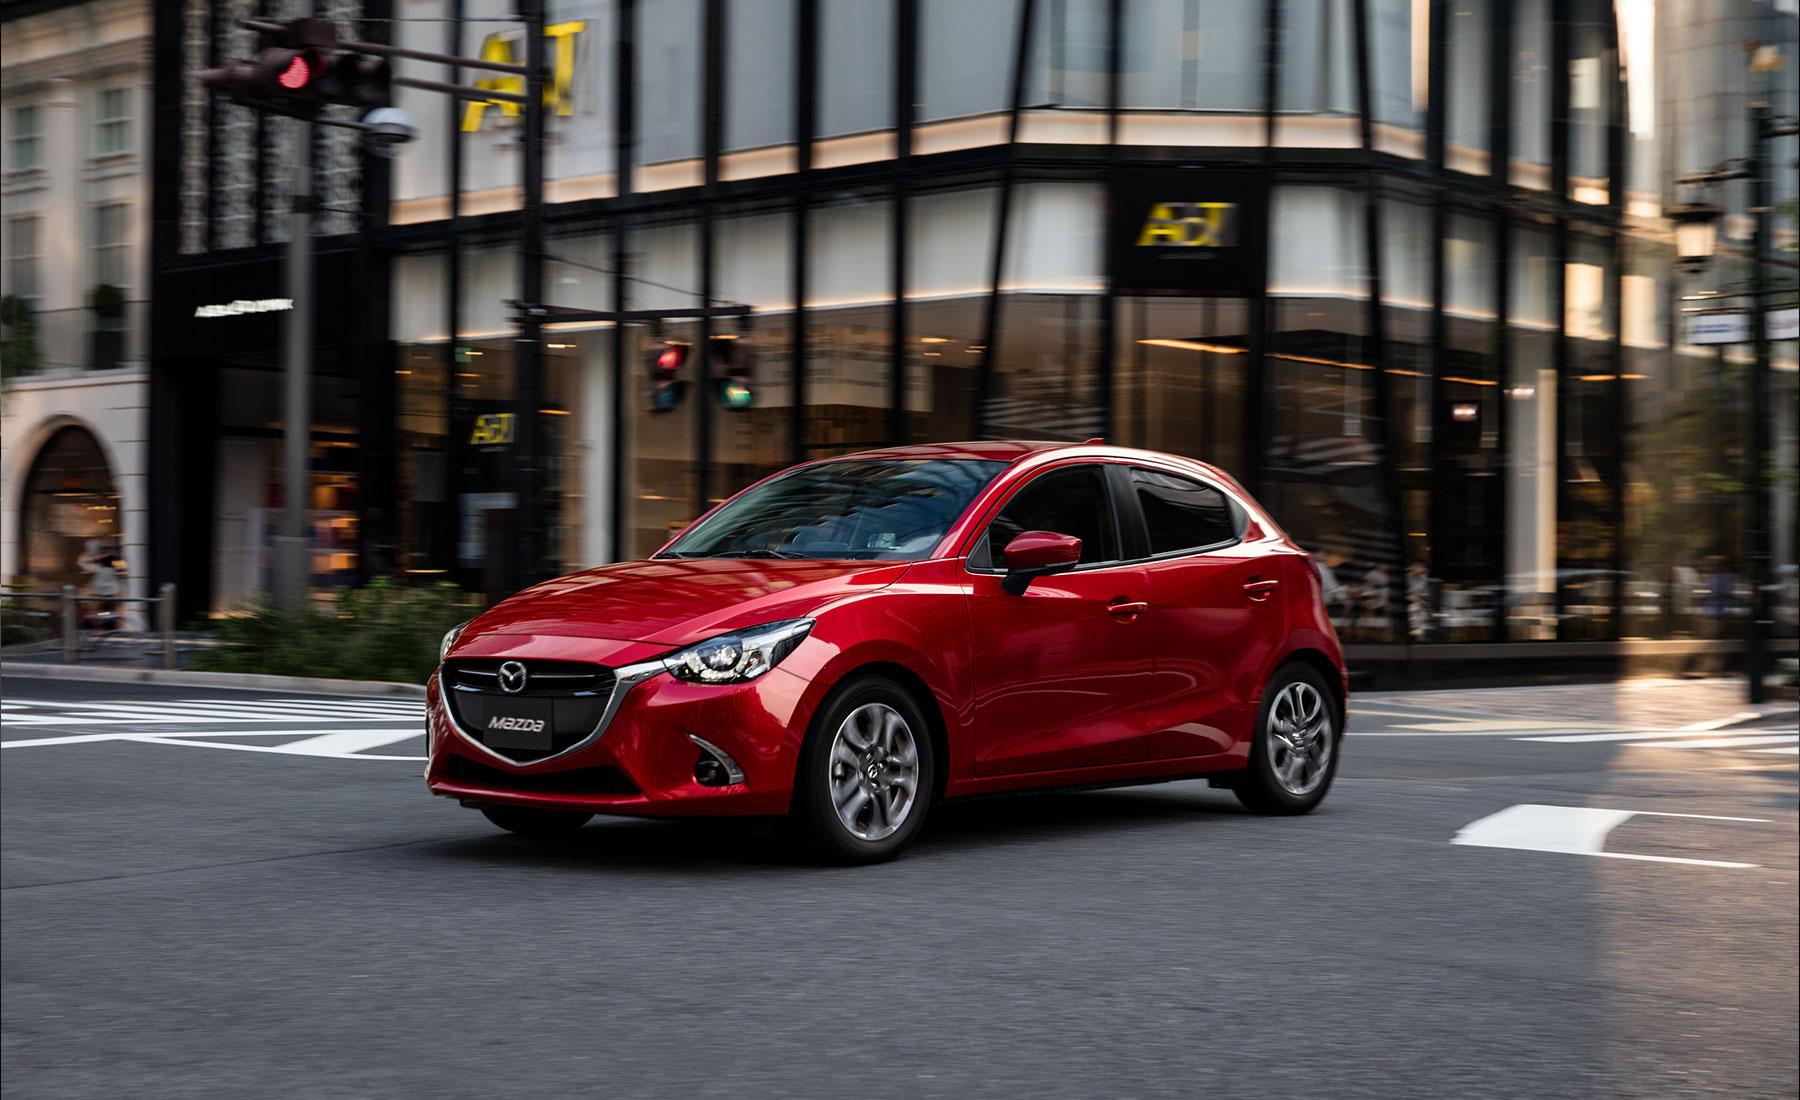 100+ [ Mazda C2 ] | Uautoknow Net All New Mazda Cx 3 ...